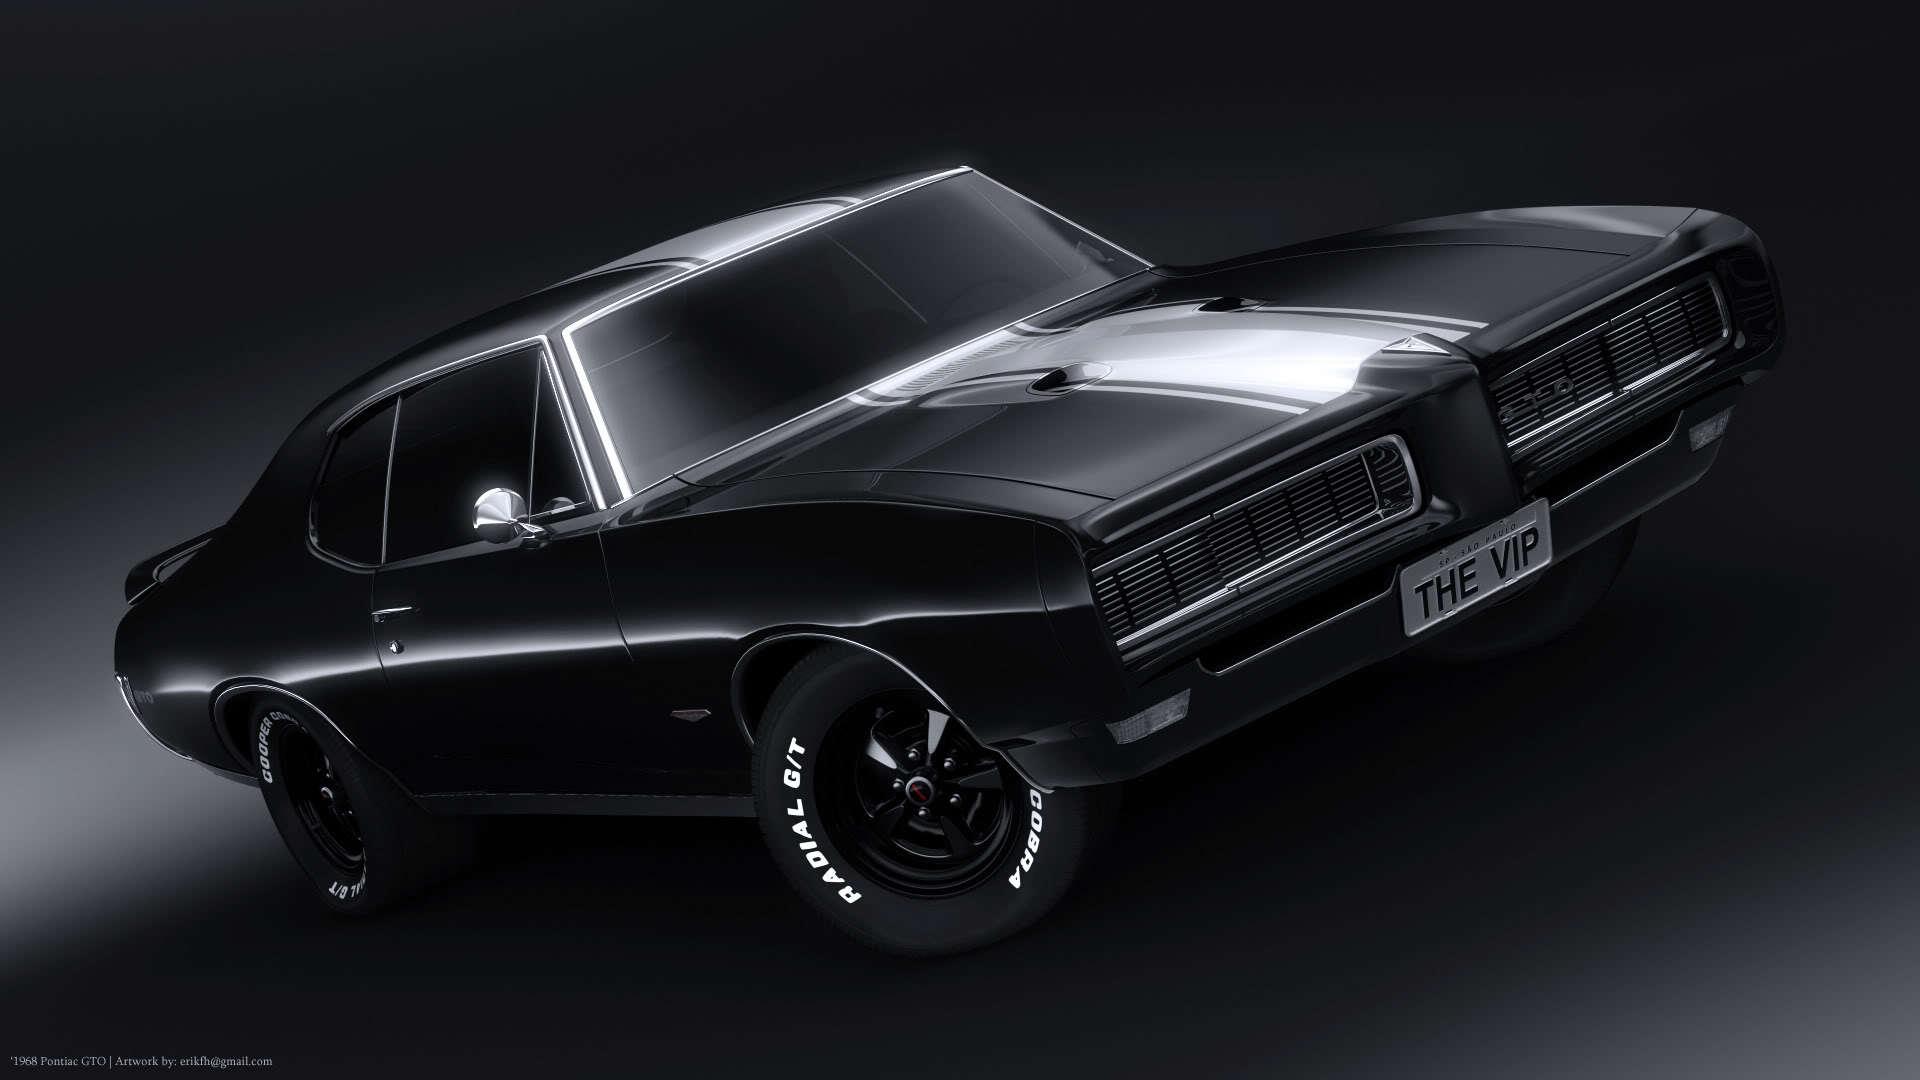 Auto   Pontiac New car Pontiac GTO  061993 jpg 1920x1080